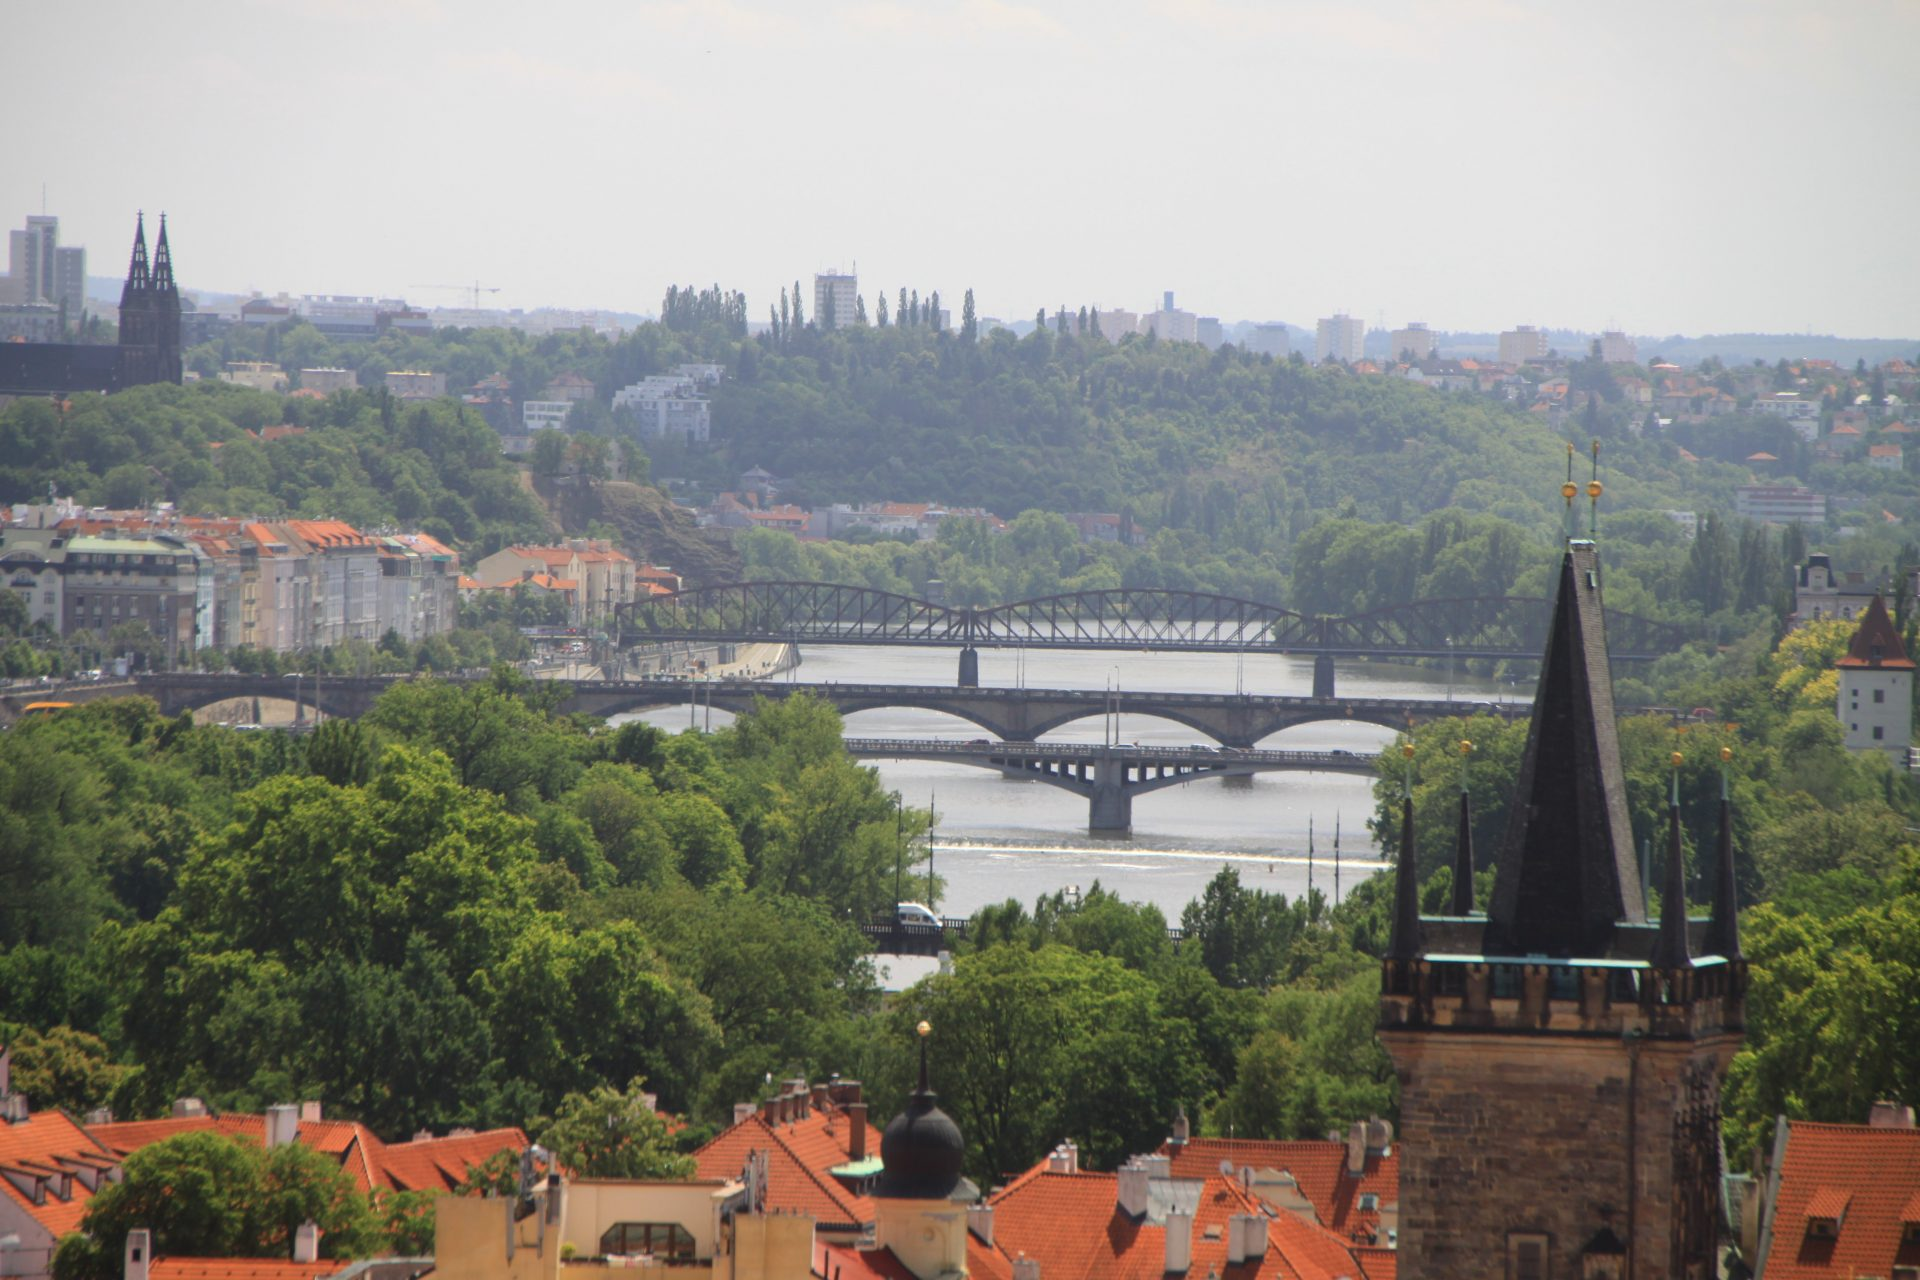 Река Влтава, Прага, Чехия. Июль, 2012